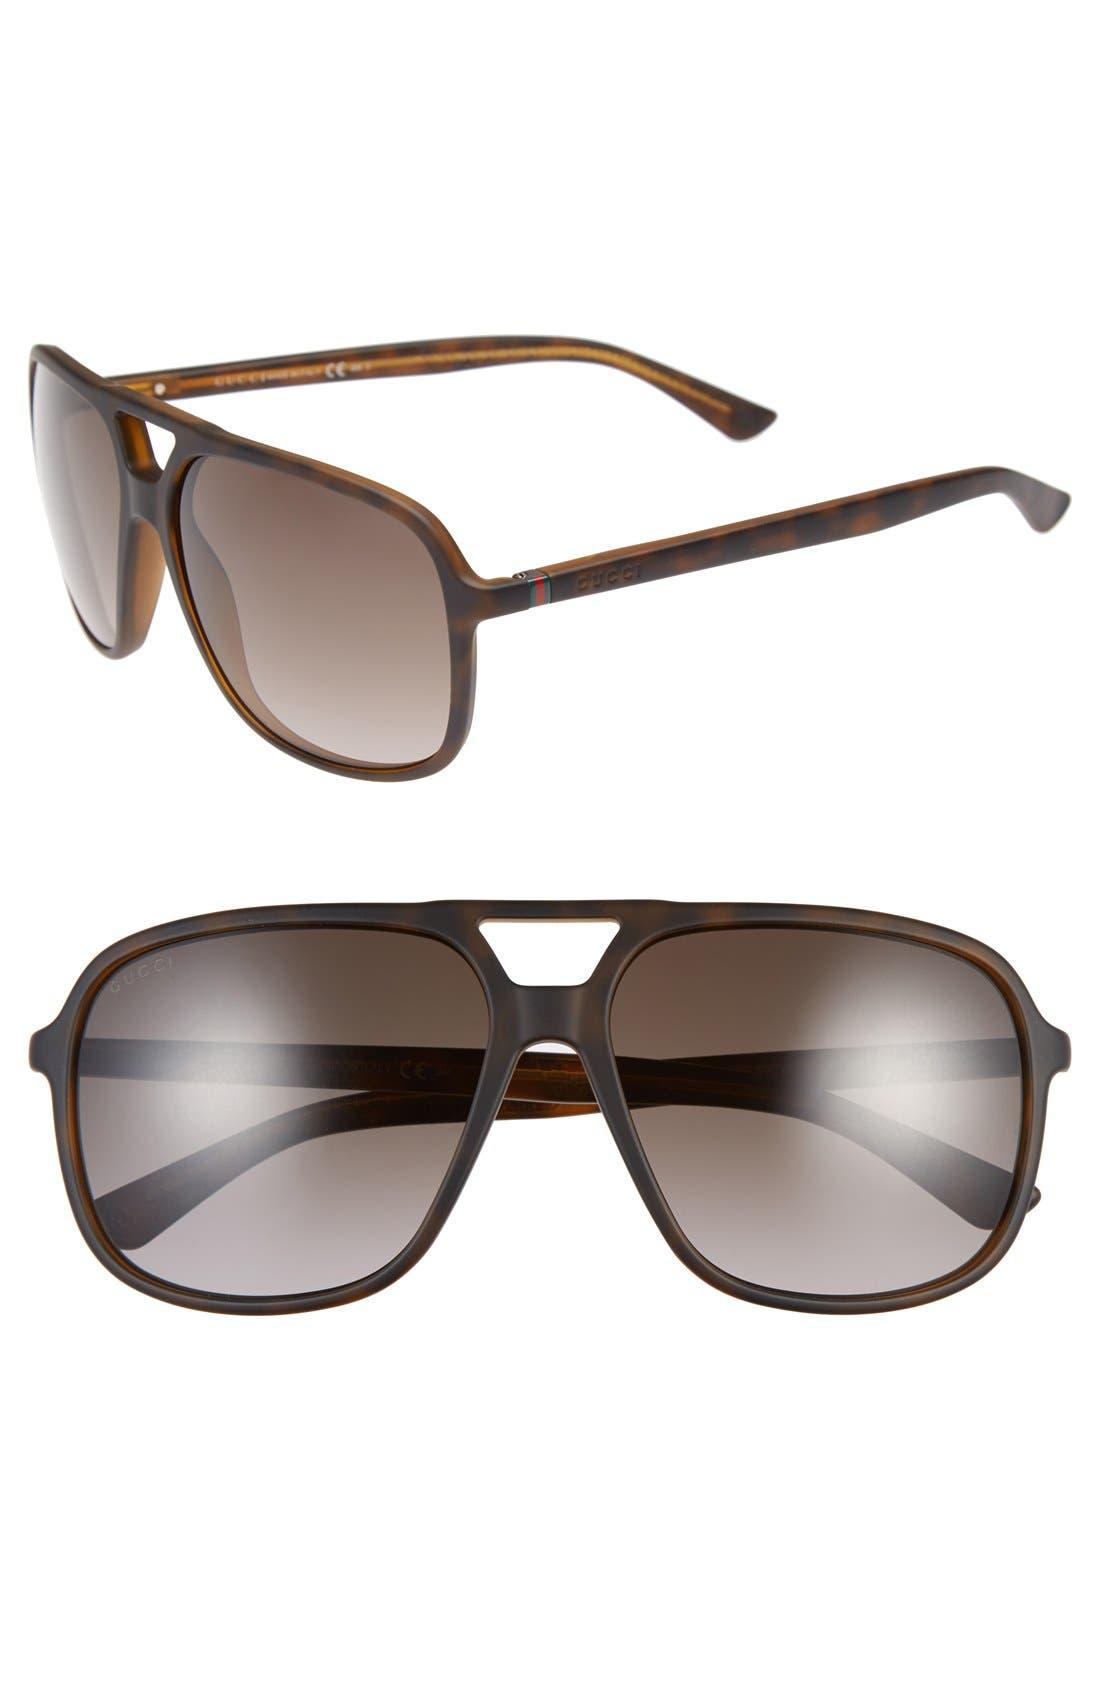 Main Image - Gucci 60mm Aviator Sunglasses